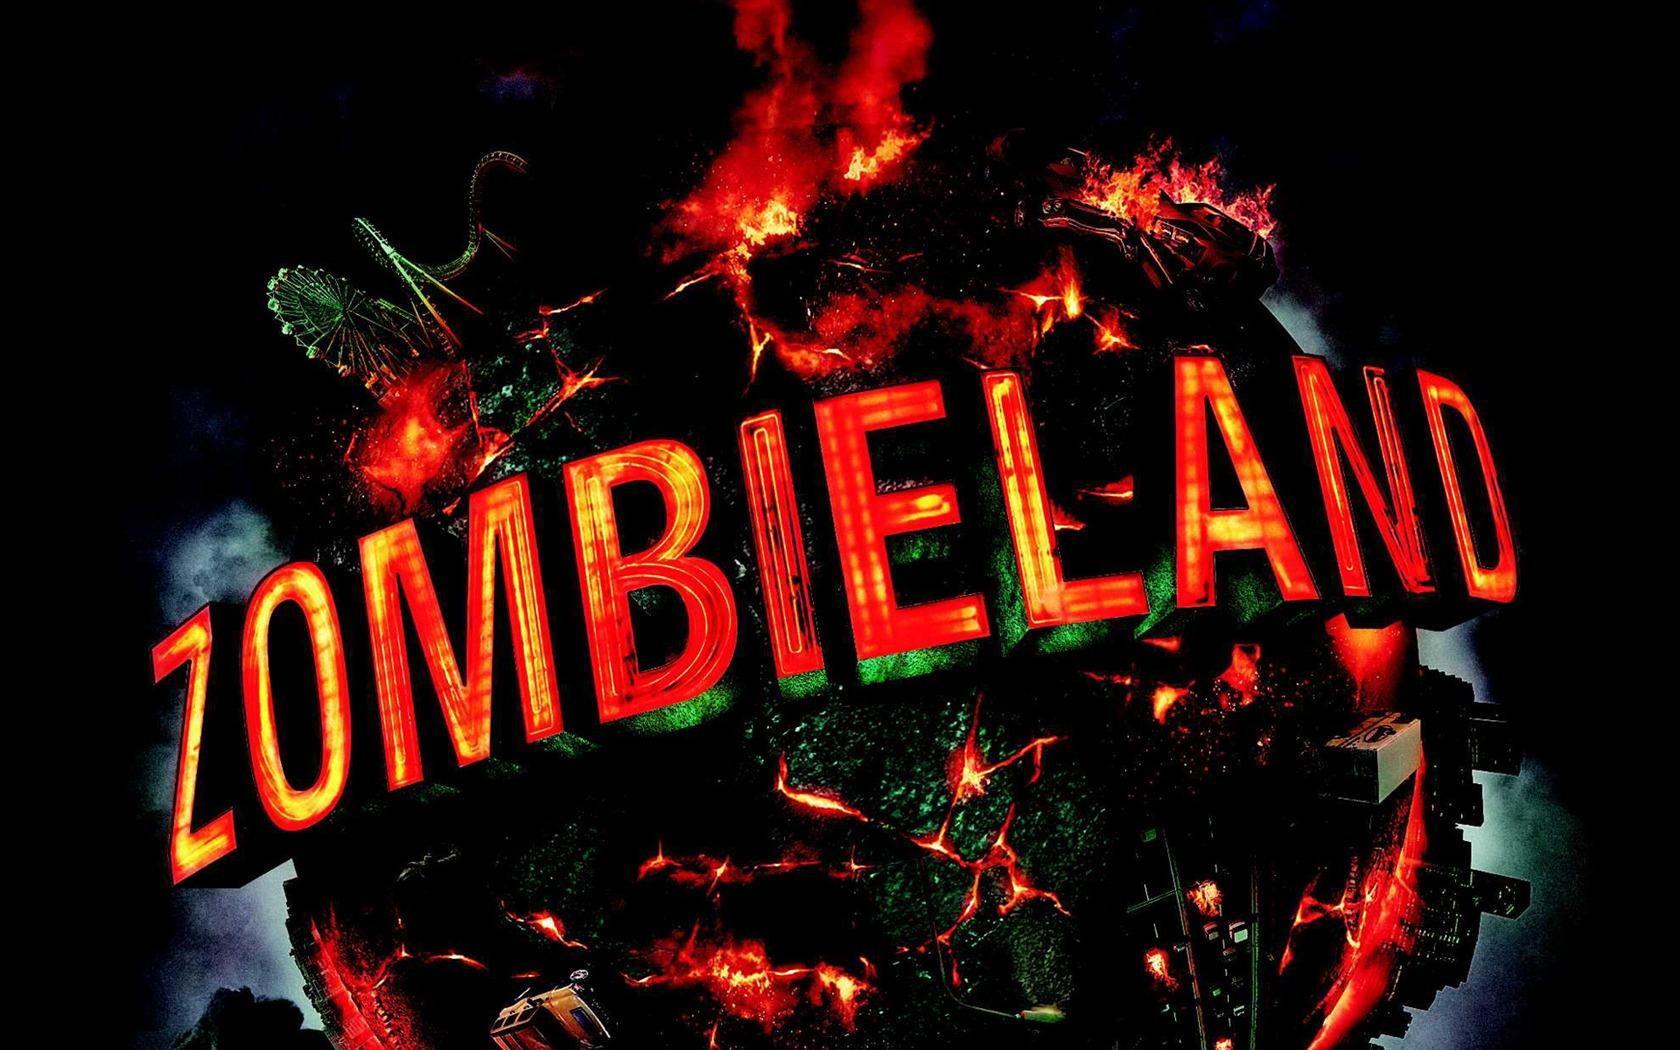 Hd wallpaper zombie - Zombieland Hd Wallpaper 34 1680x1050 Wallpaper Download